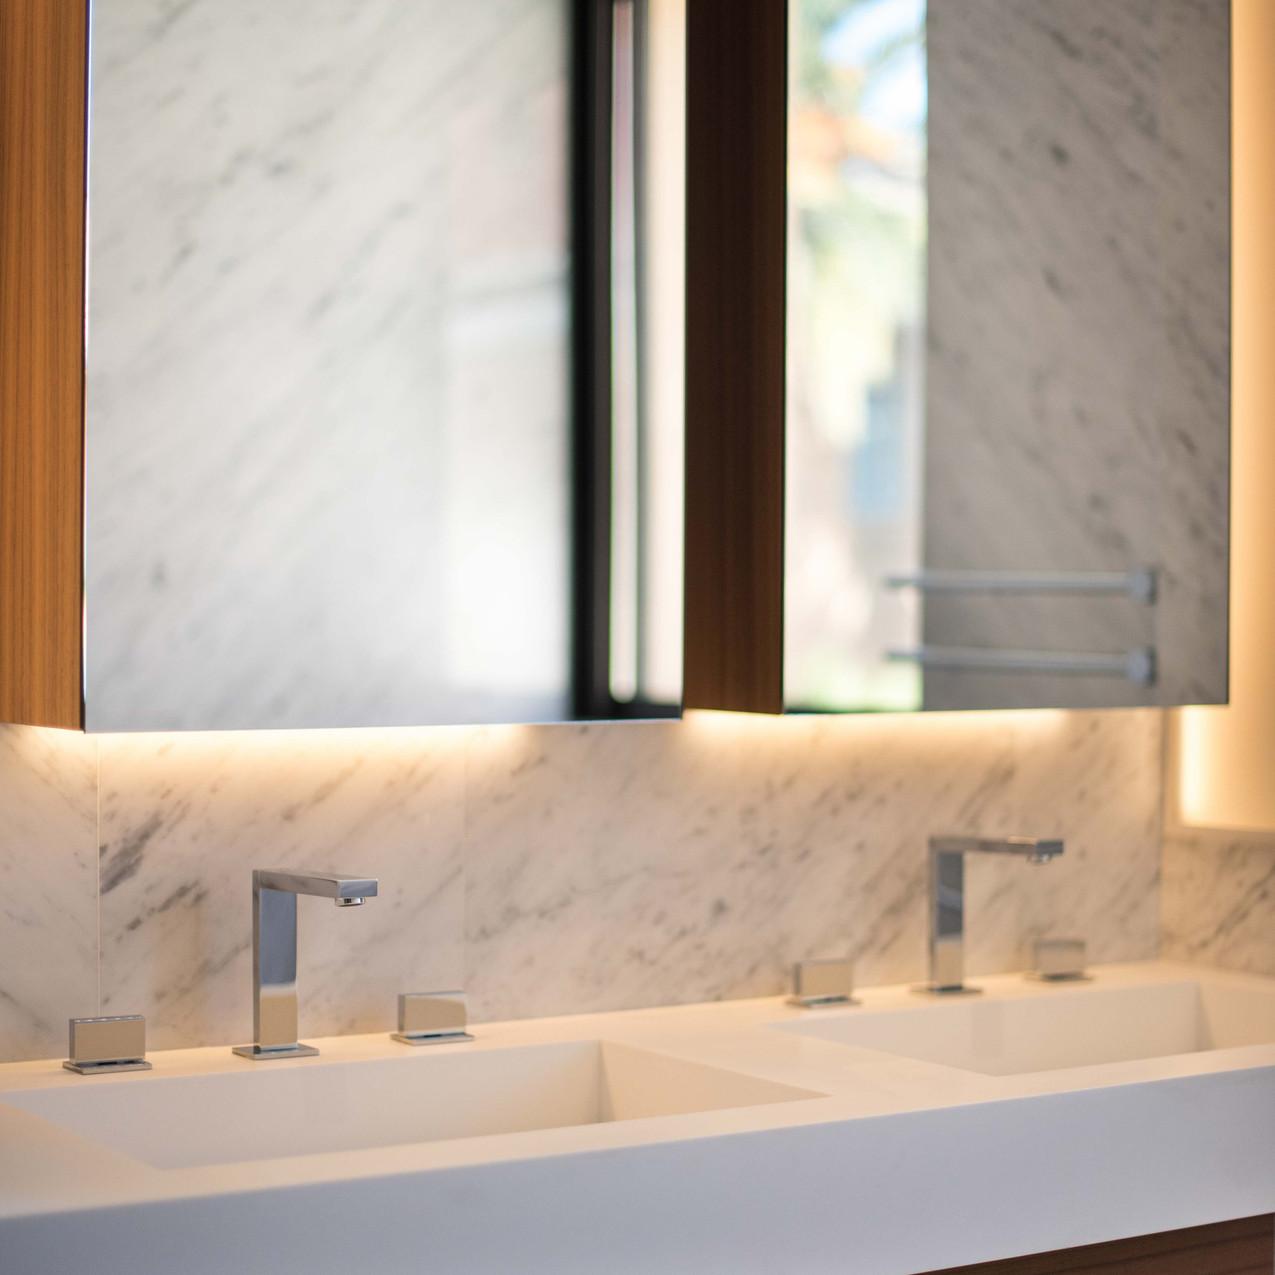 photographe architecture nice france french riviera paca cote dazur interieur-22